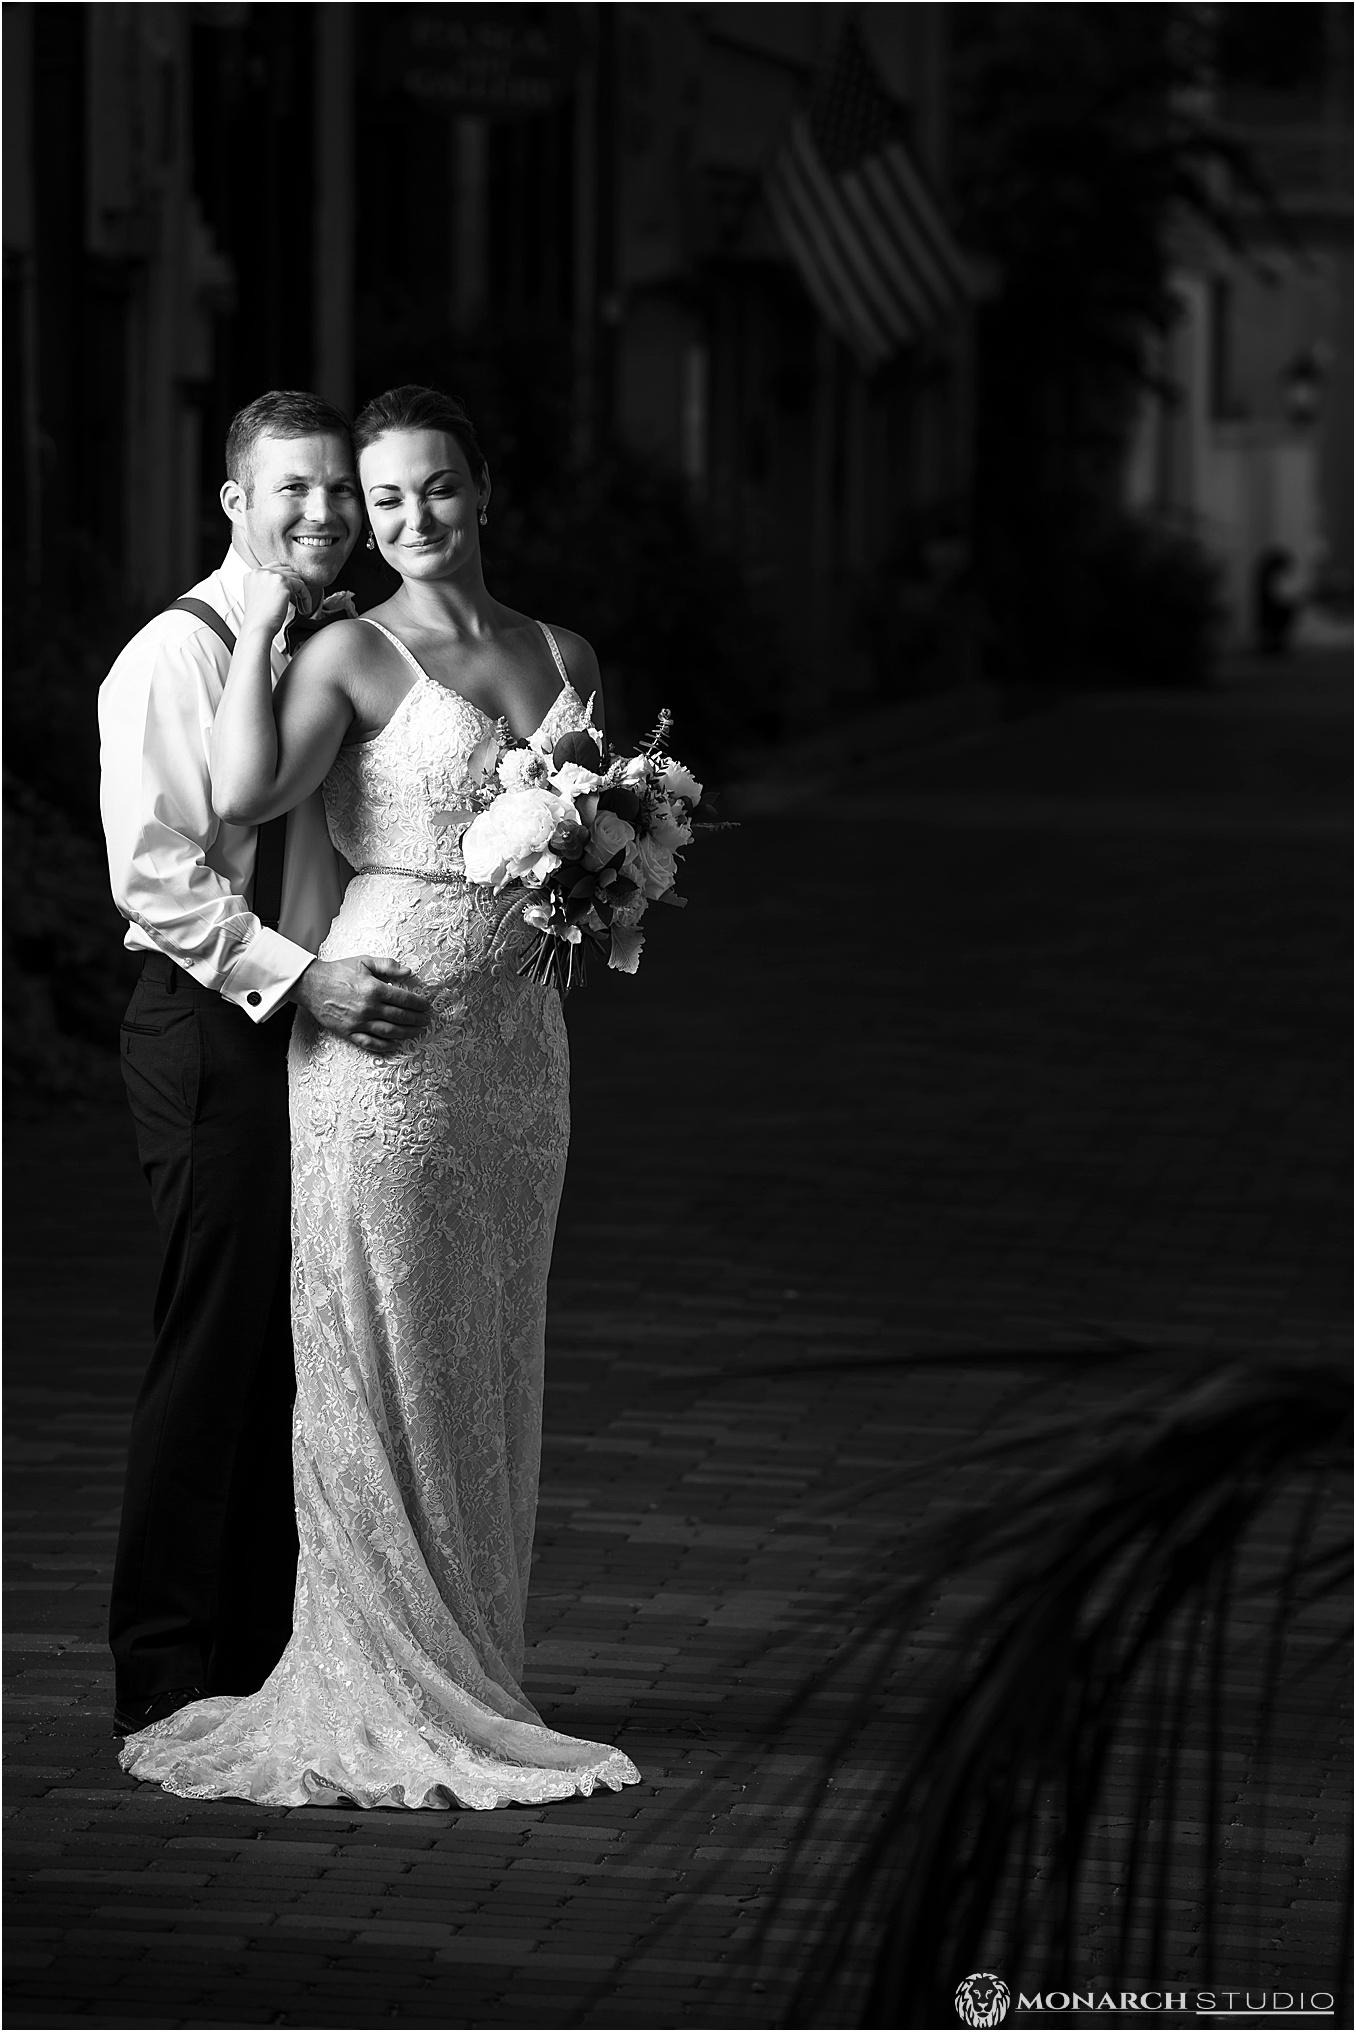 048-whiteroom-wedding-photographer-2019-05-22_0030.jpg